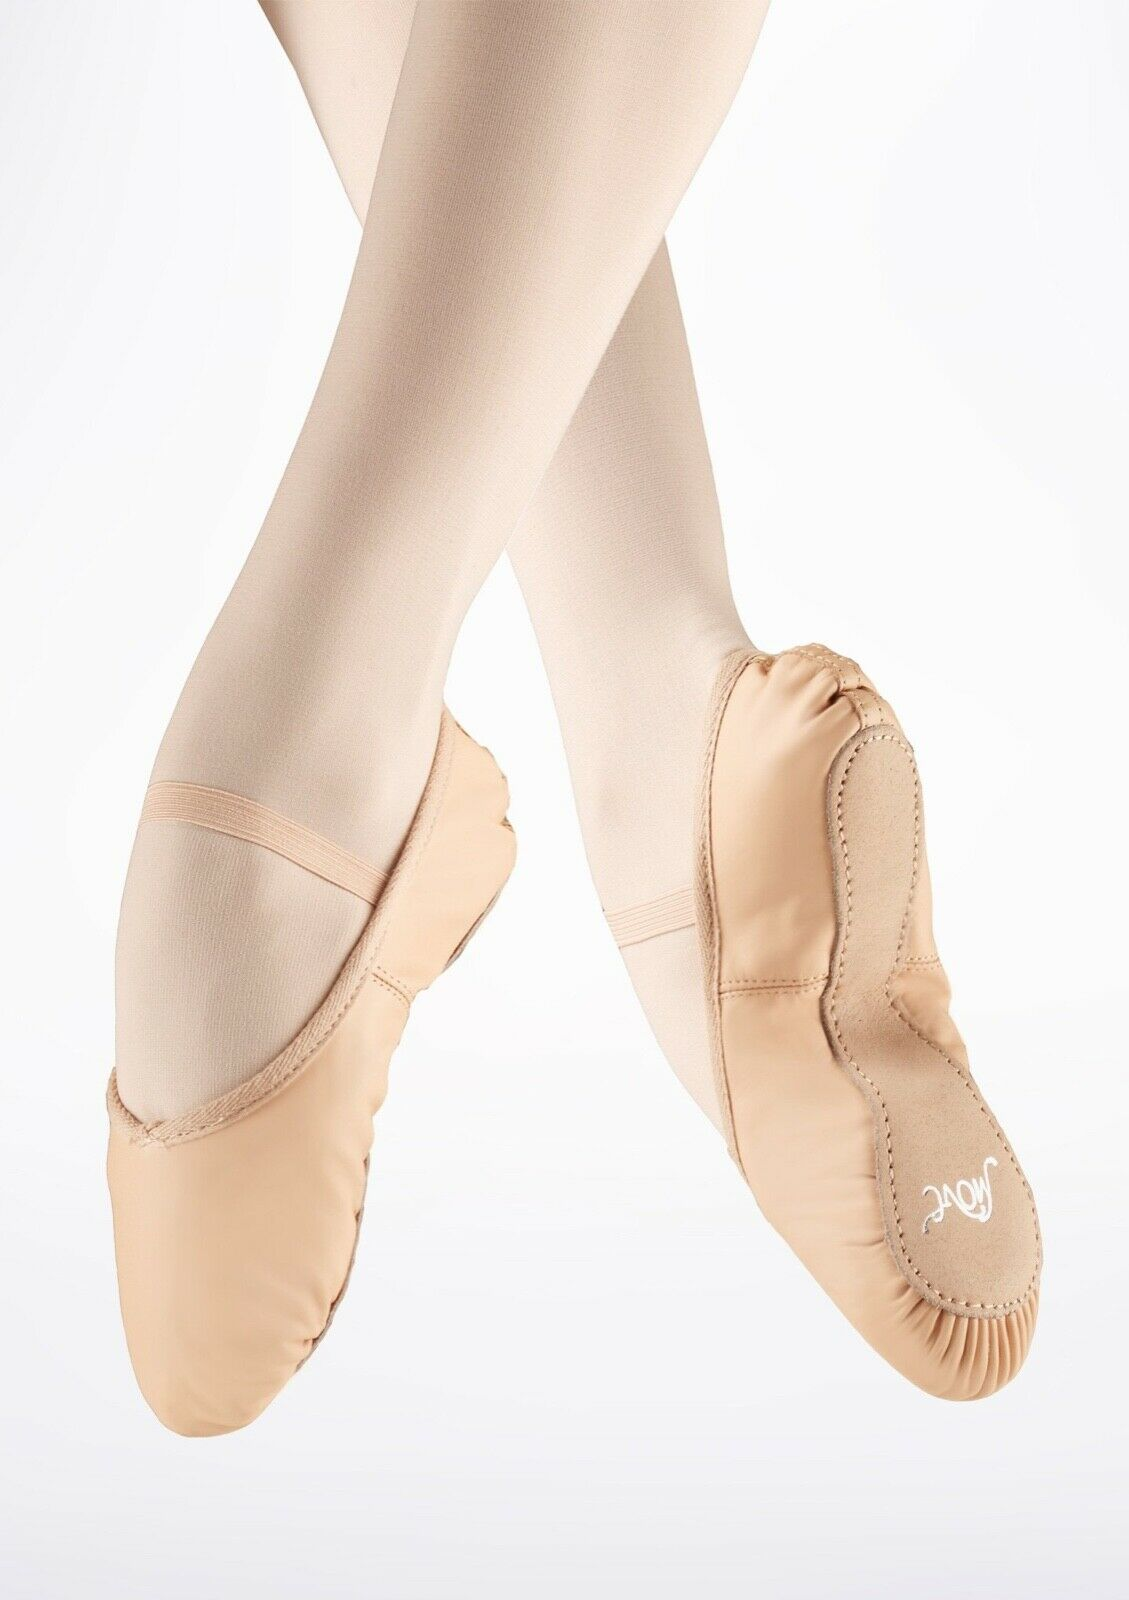 Ballet Full Sole Leather Ballet Shoe Pink Move Dancewear